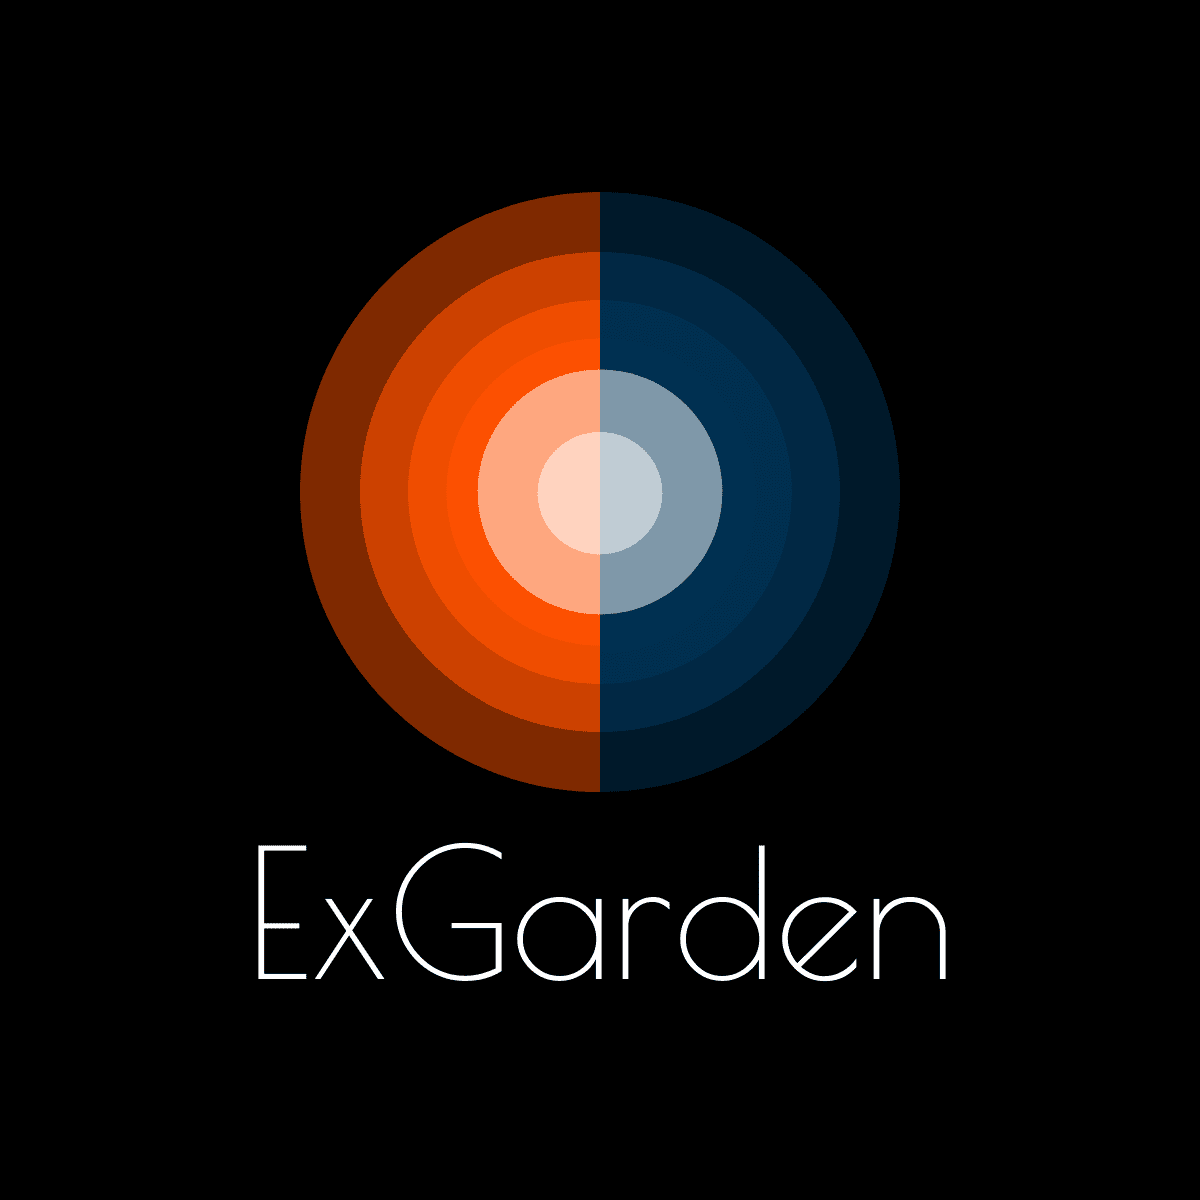 ExGarden